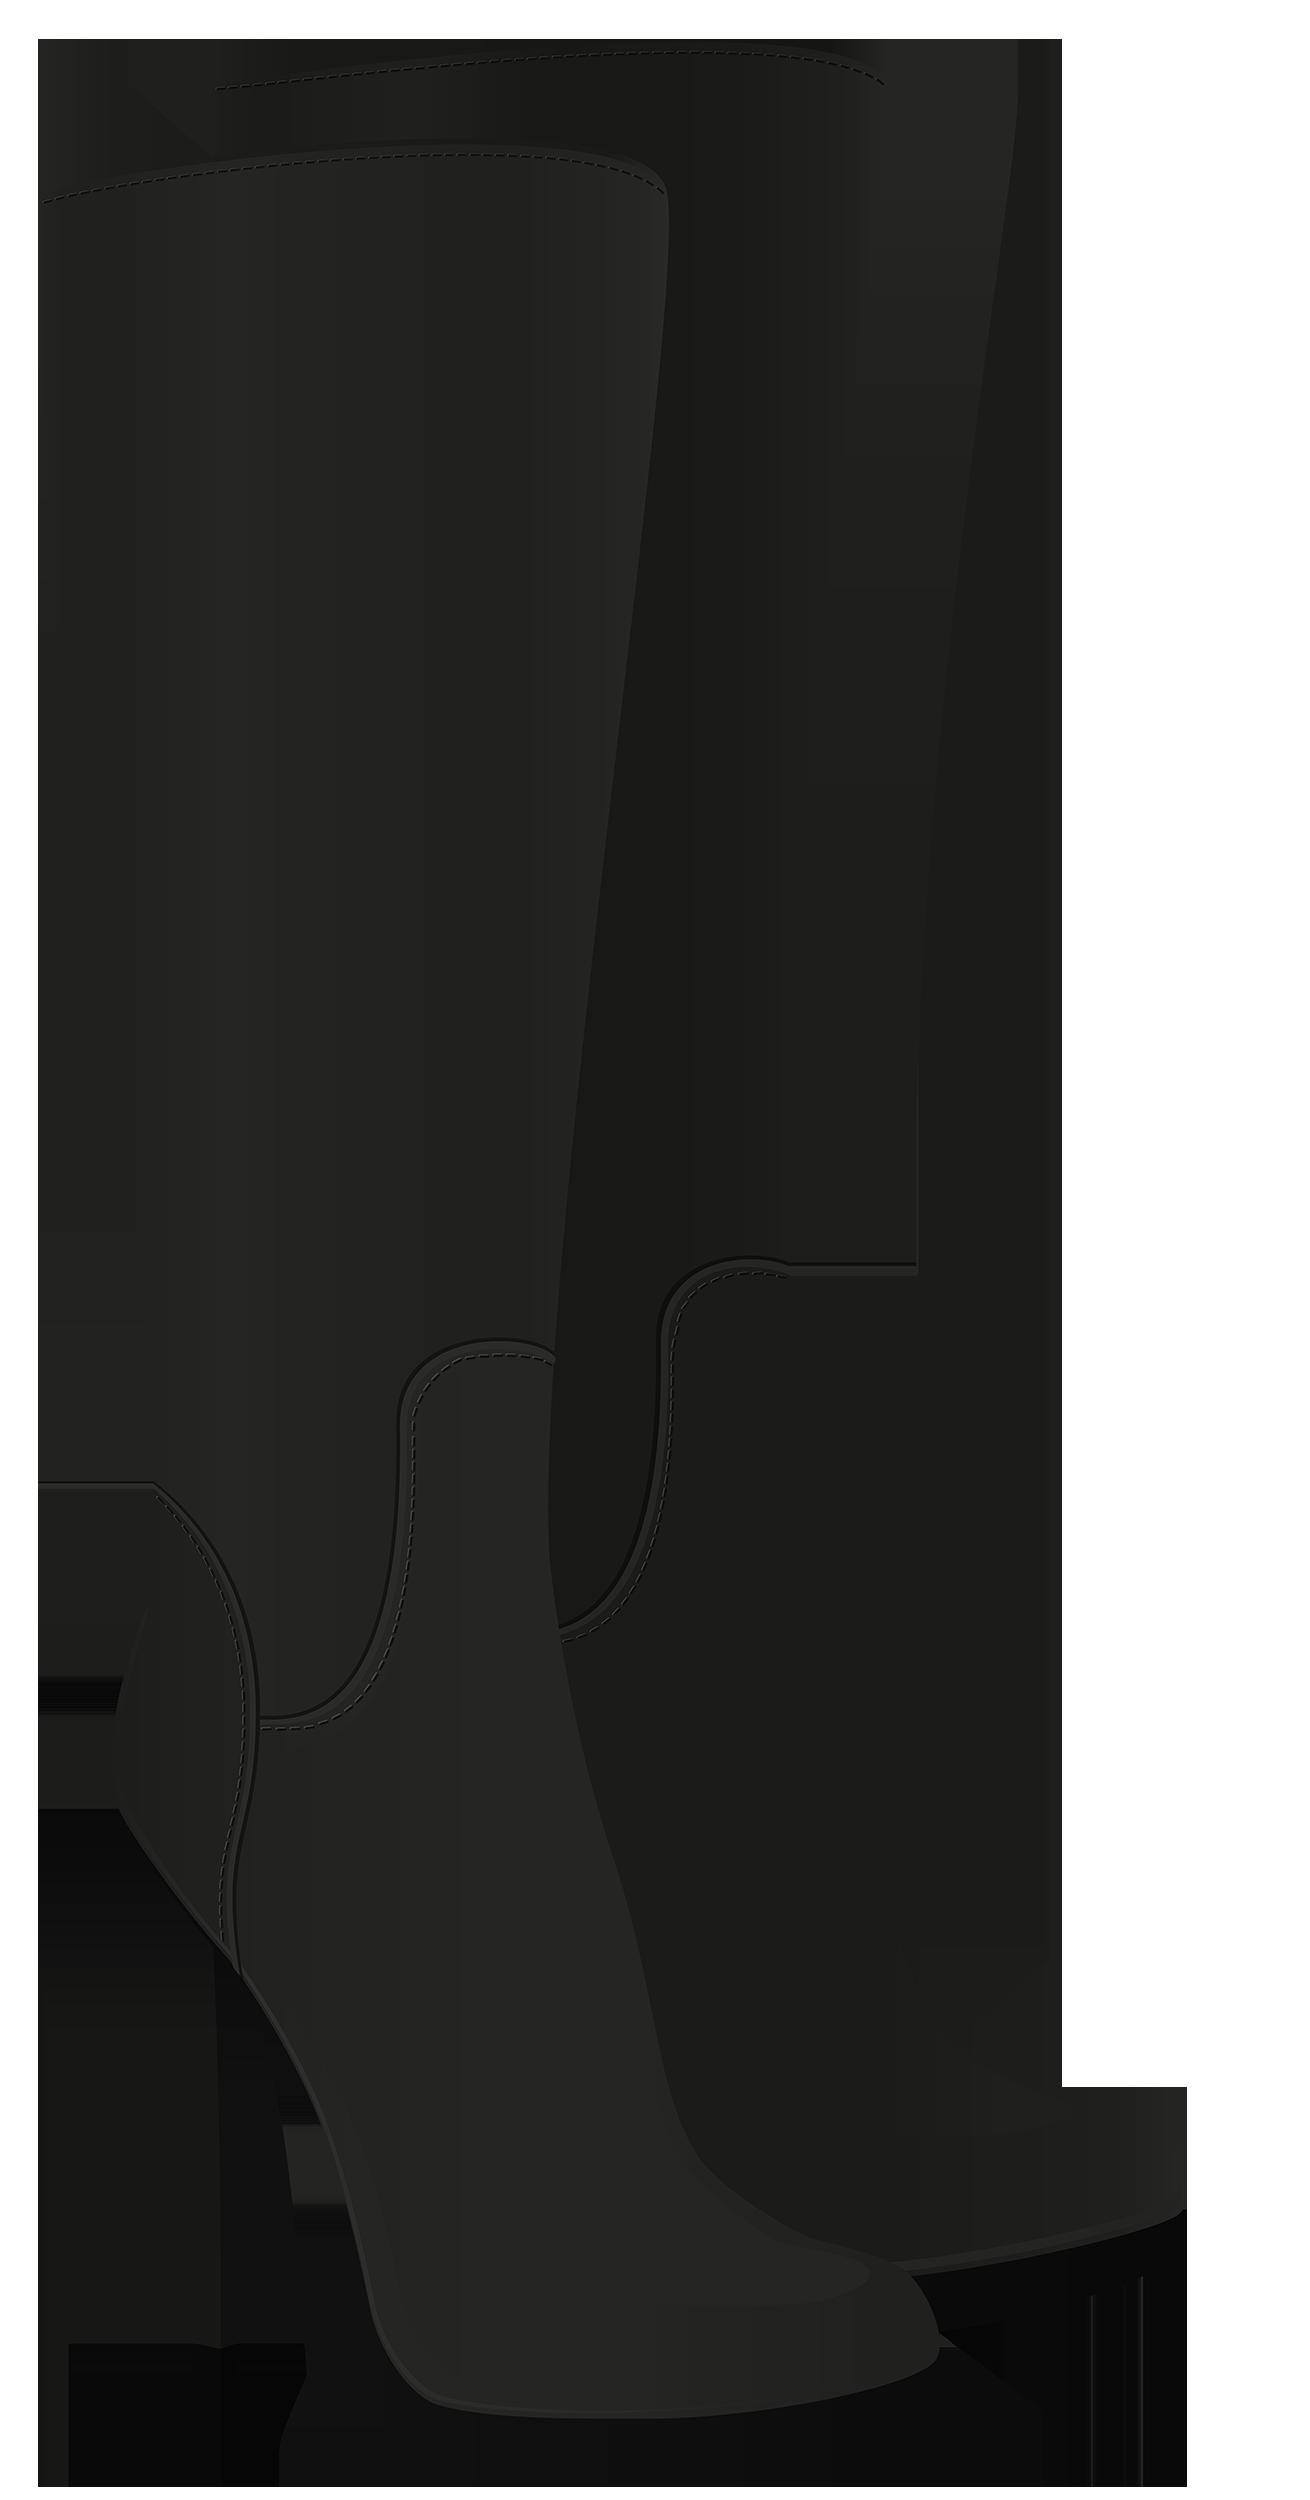 Black Boots Clipart.